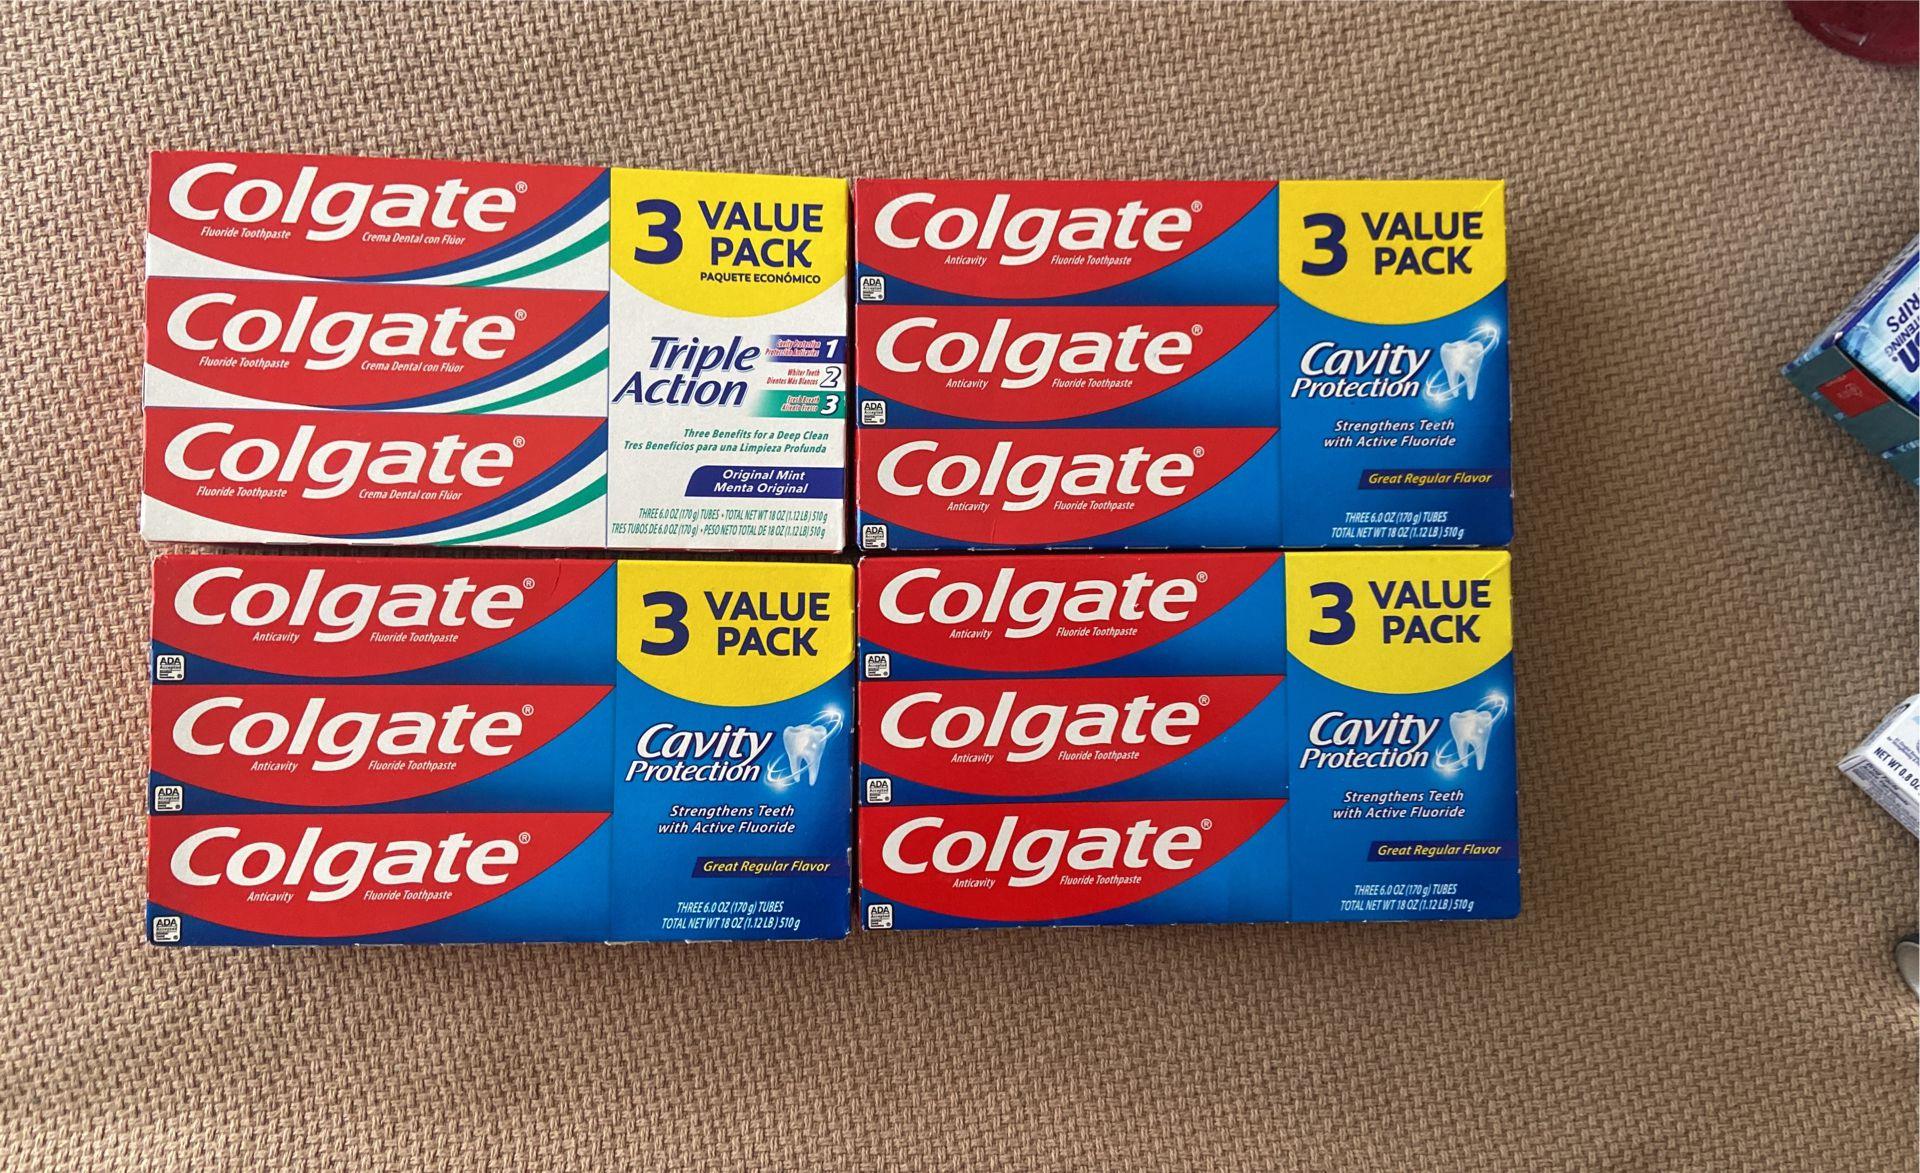 Colgate Value Pack